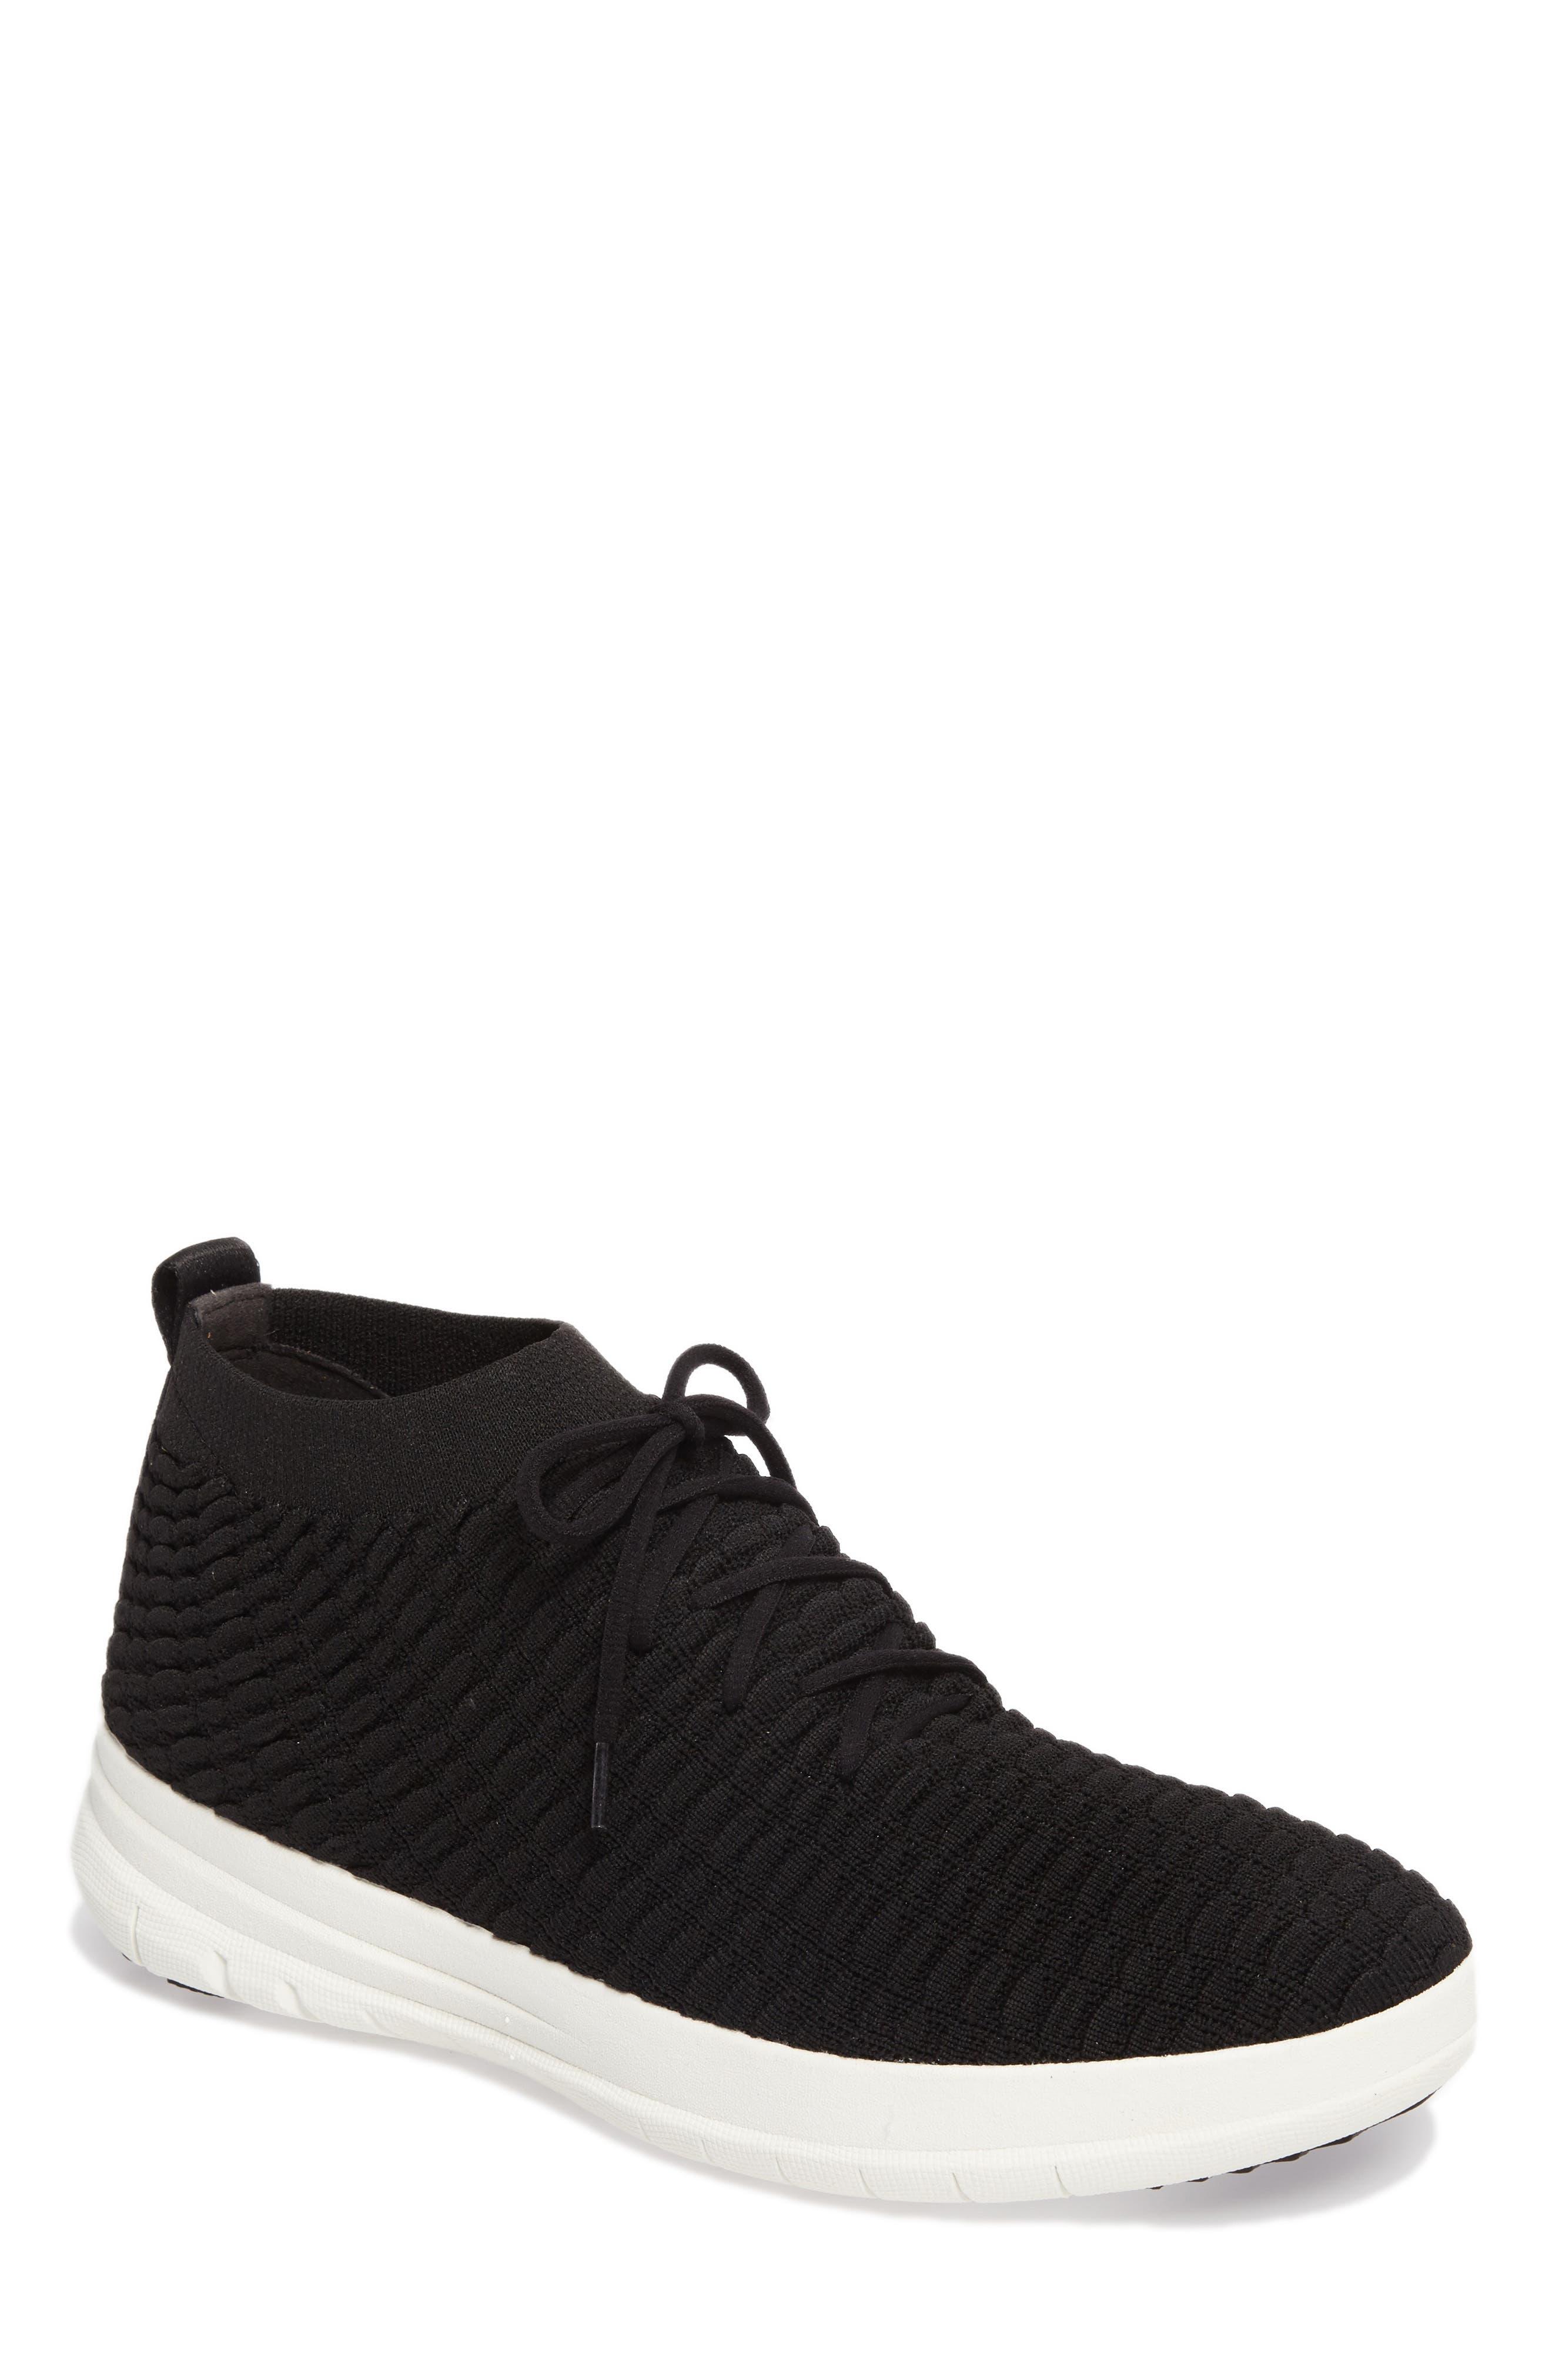 Uberknit Sneaker,                             Main thumbnail 1, color,                             Black Textile